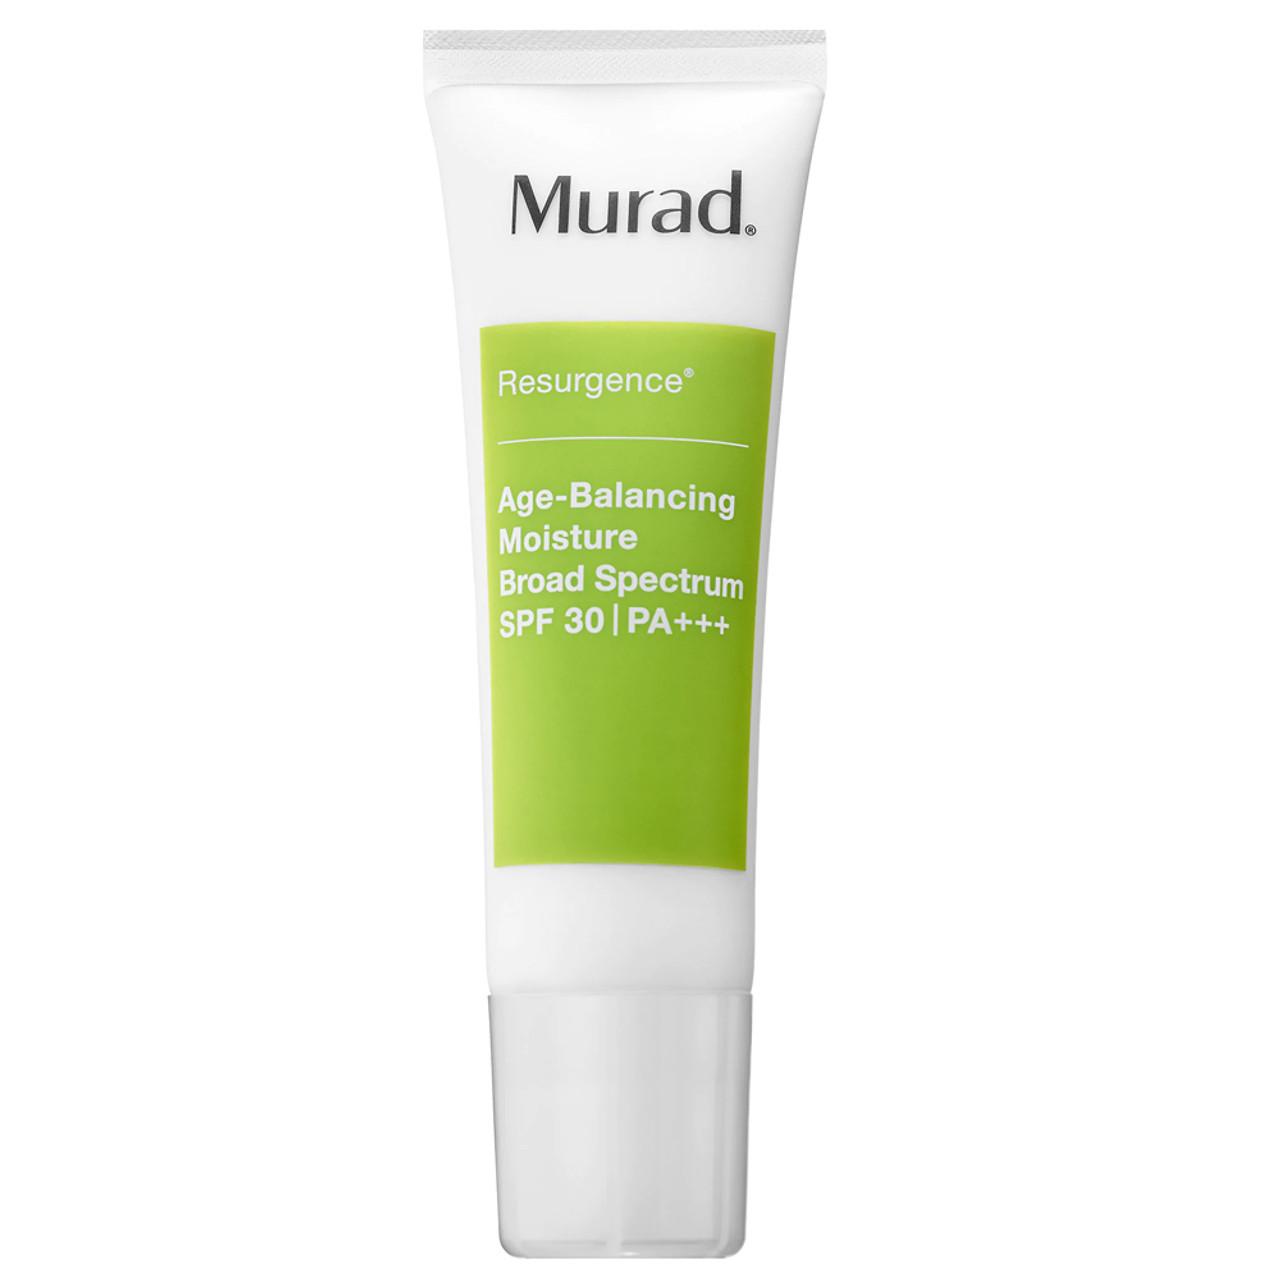 Murad Resurgence™ Age-Balancing Moisture Broad Spectrum SPF 30 | PA+++